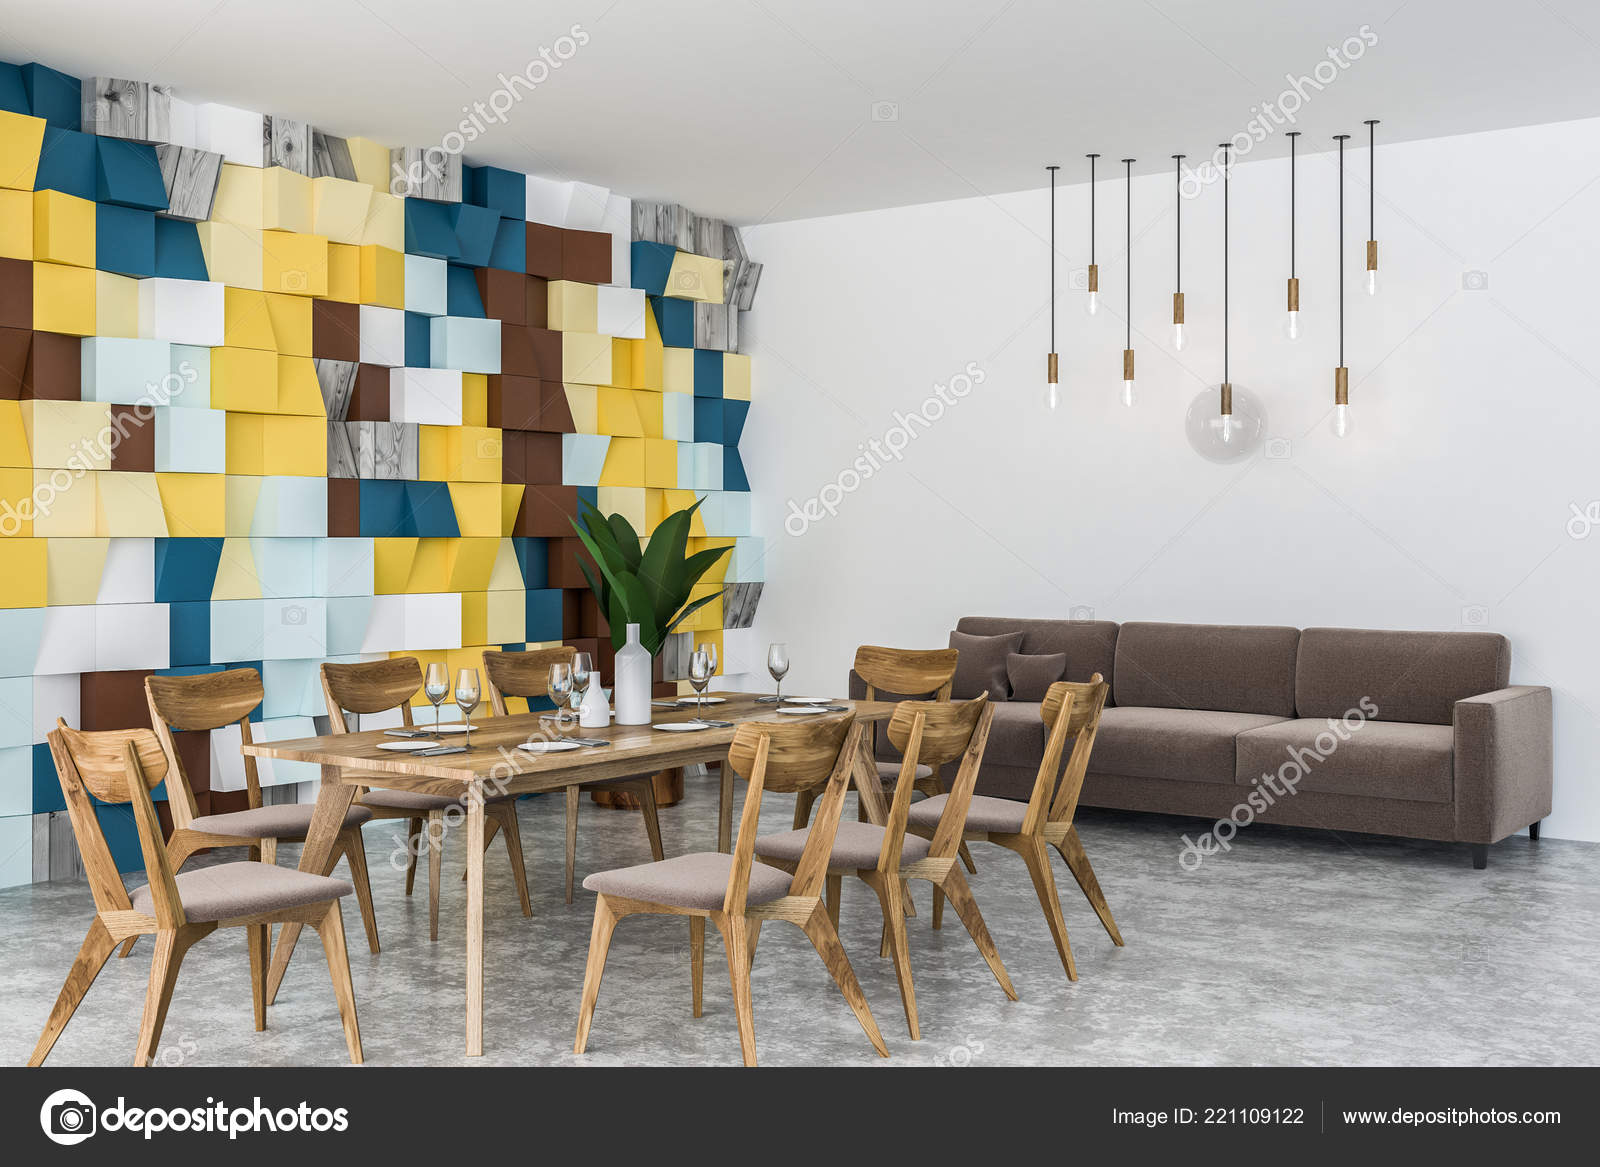 Comedor Elegante Con Colores Pared Azulejos Piso Concreto Mesa ...